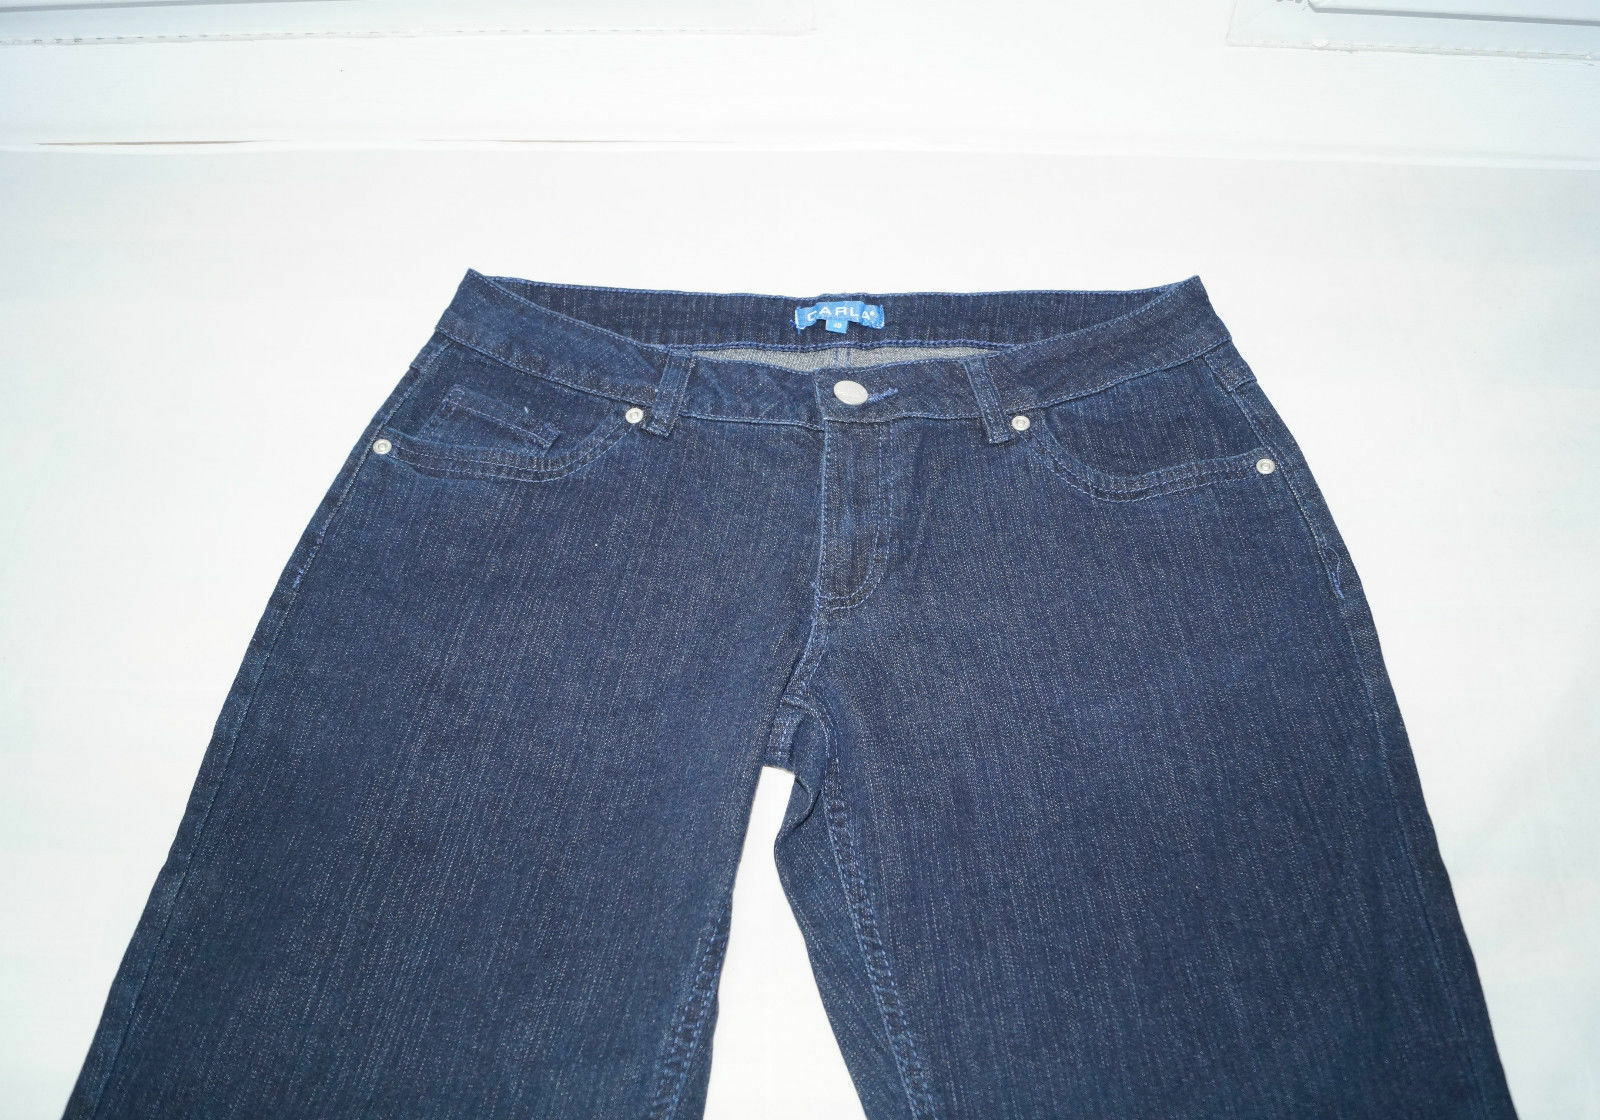 Damen-Stretch-Jeans-9-versch-Modelle-Jeanshose-Hose-Elasthan-bequem-Oko-Tex Indexbild 13